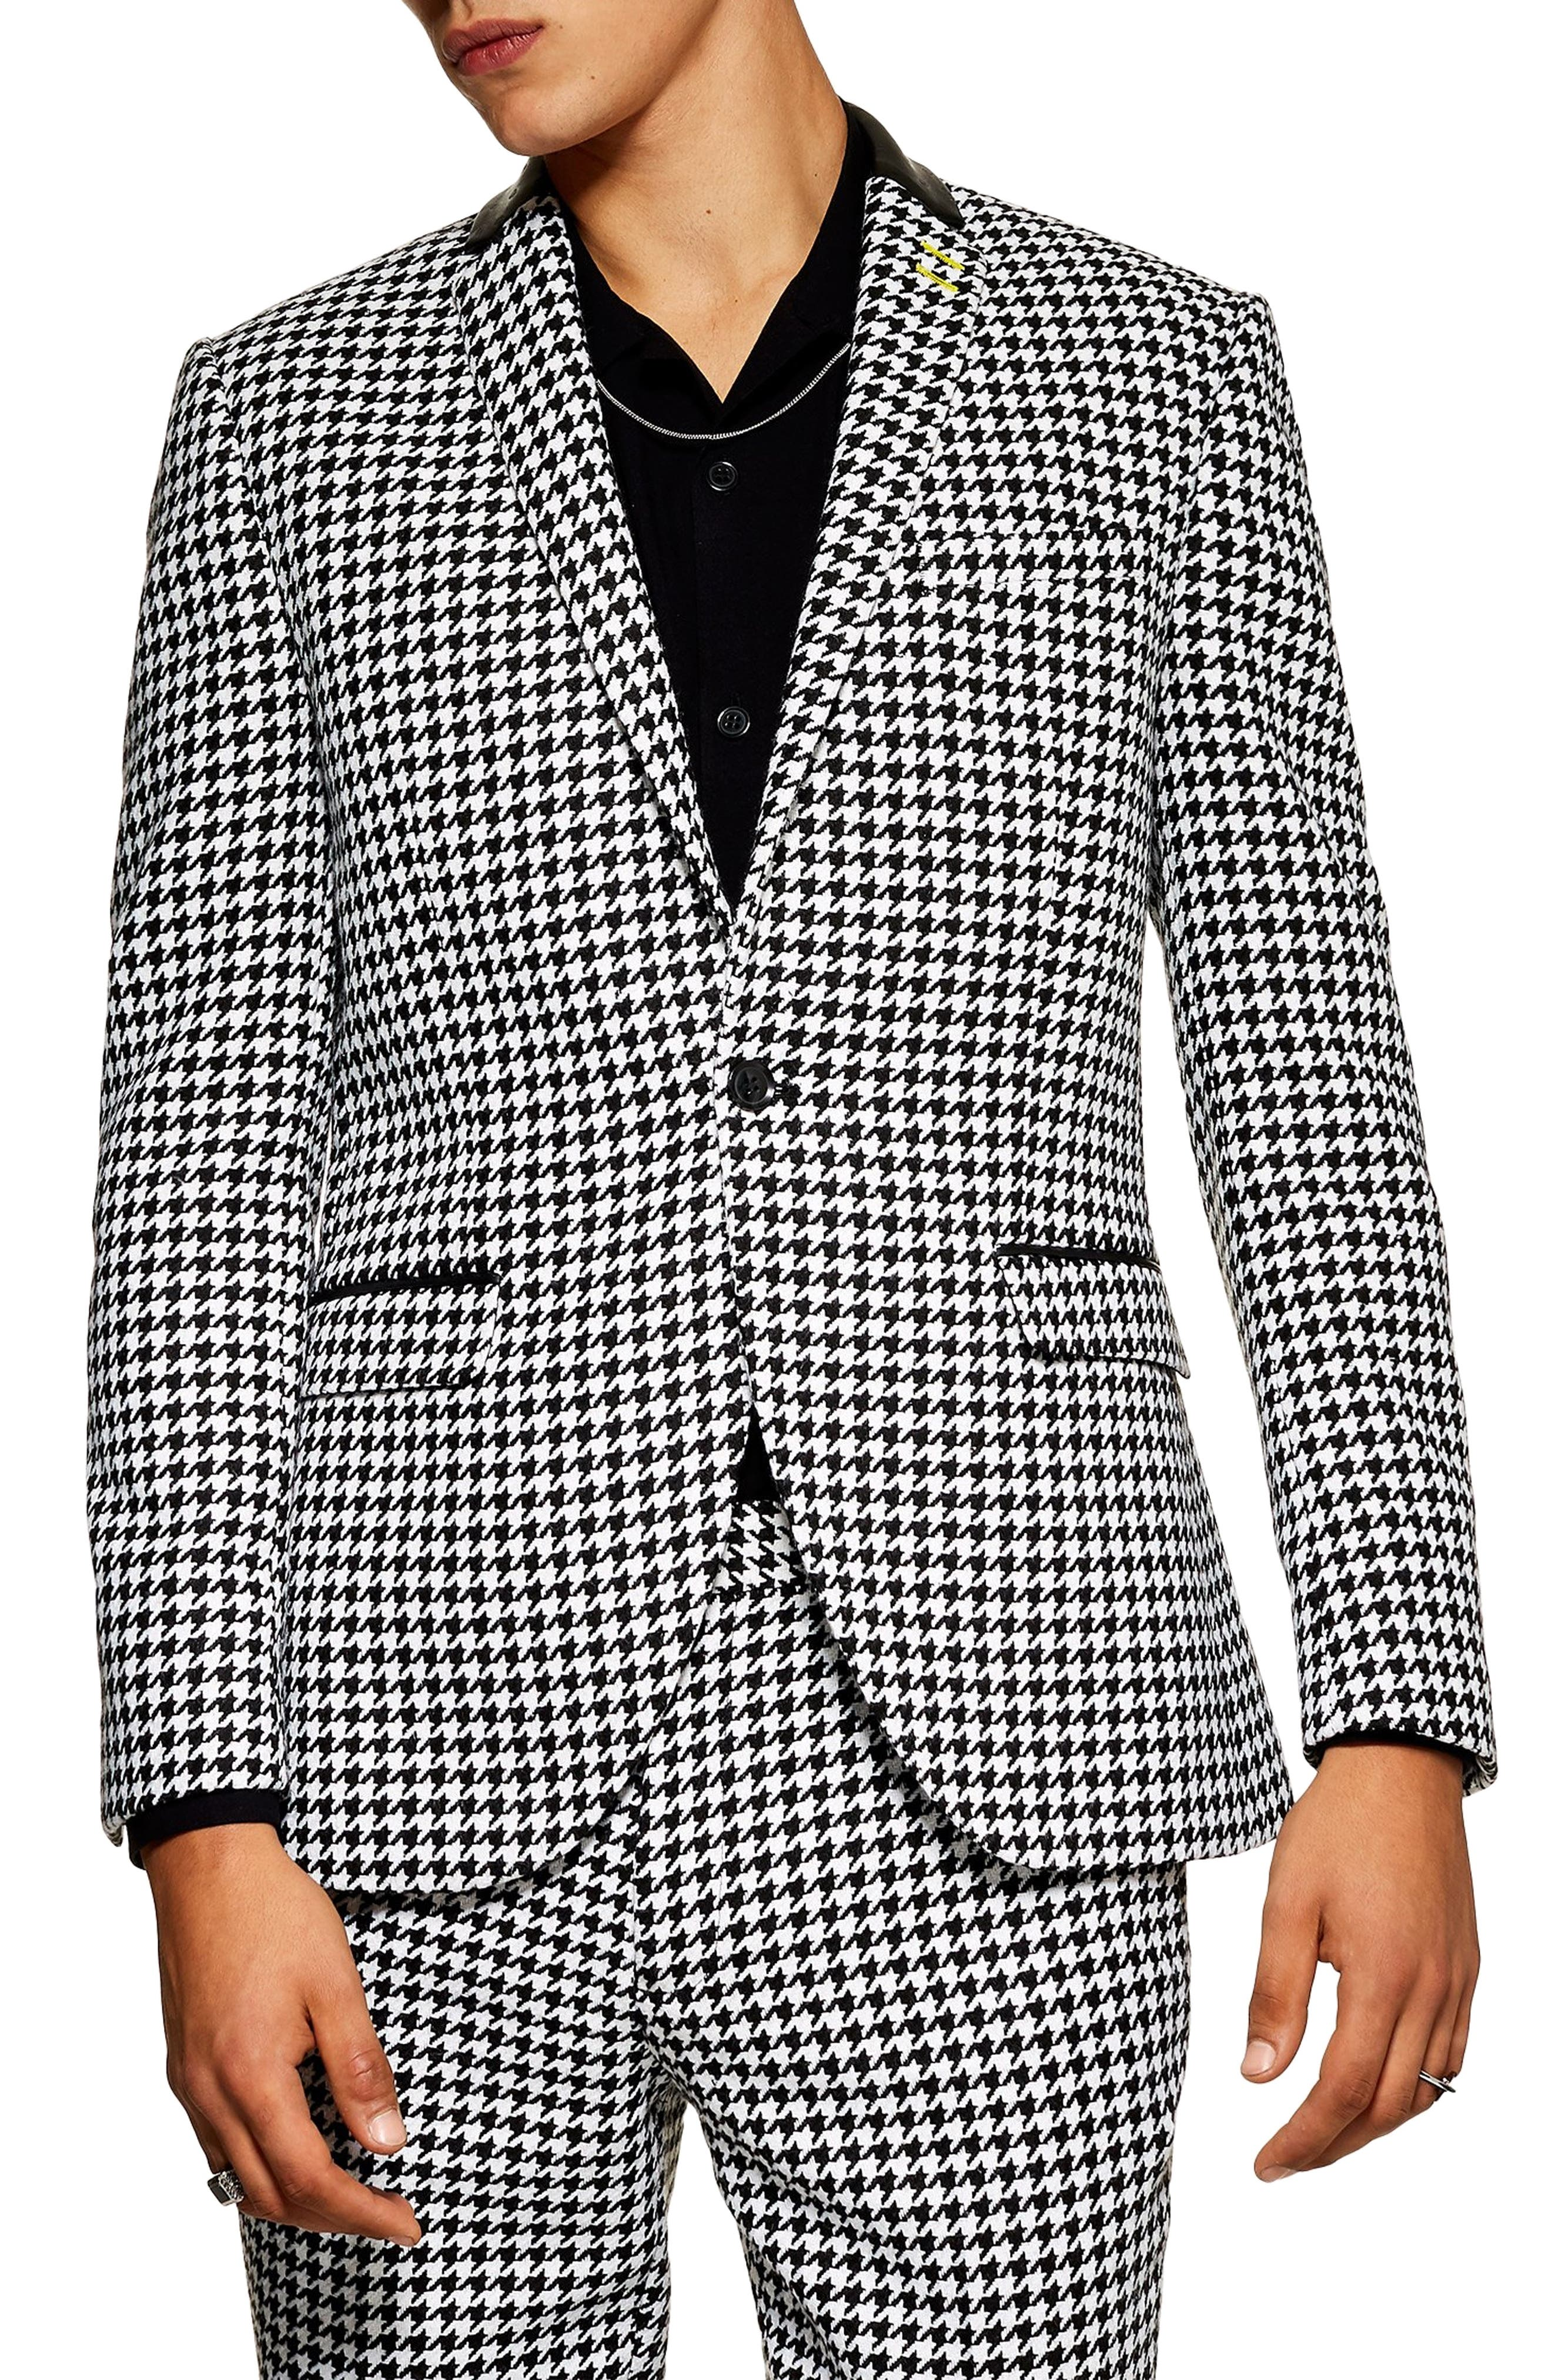 TOPMAN Roe Skinny Fit Suit Jacket, Main, color, 001